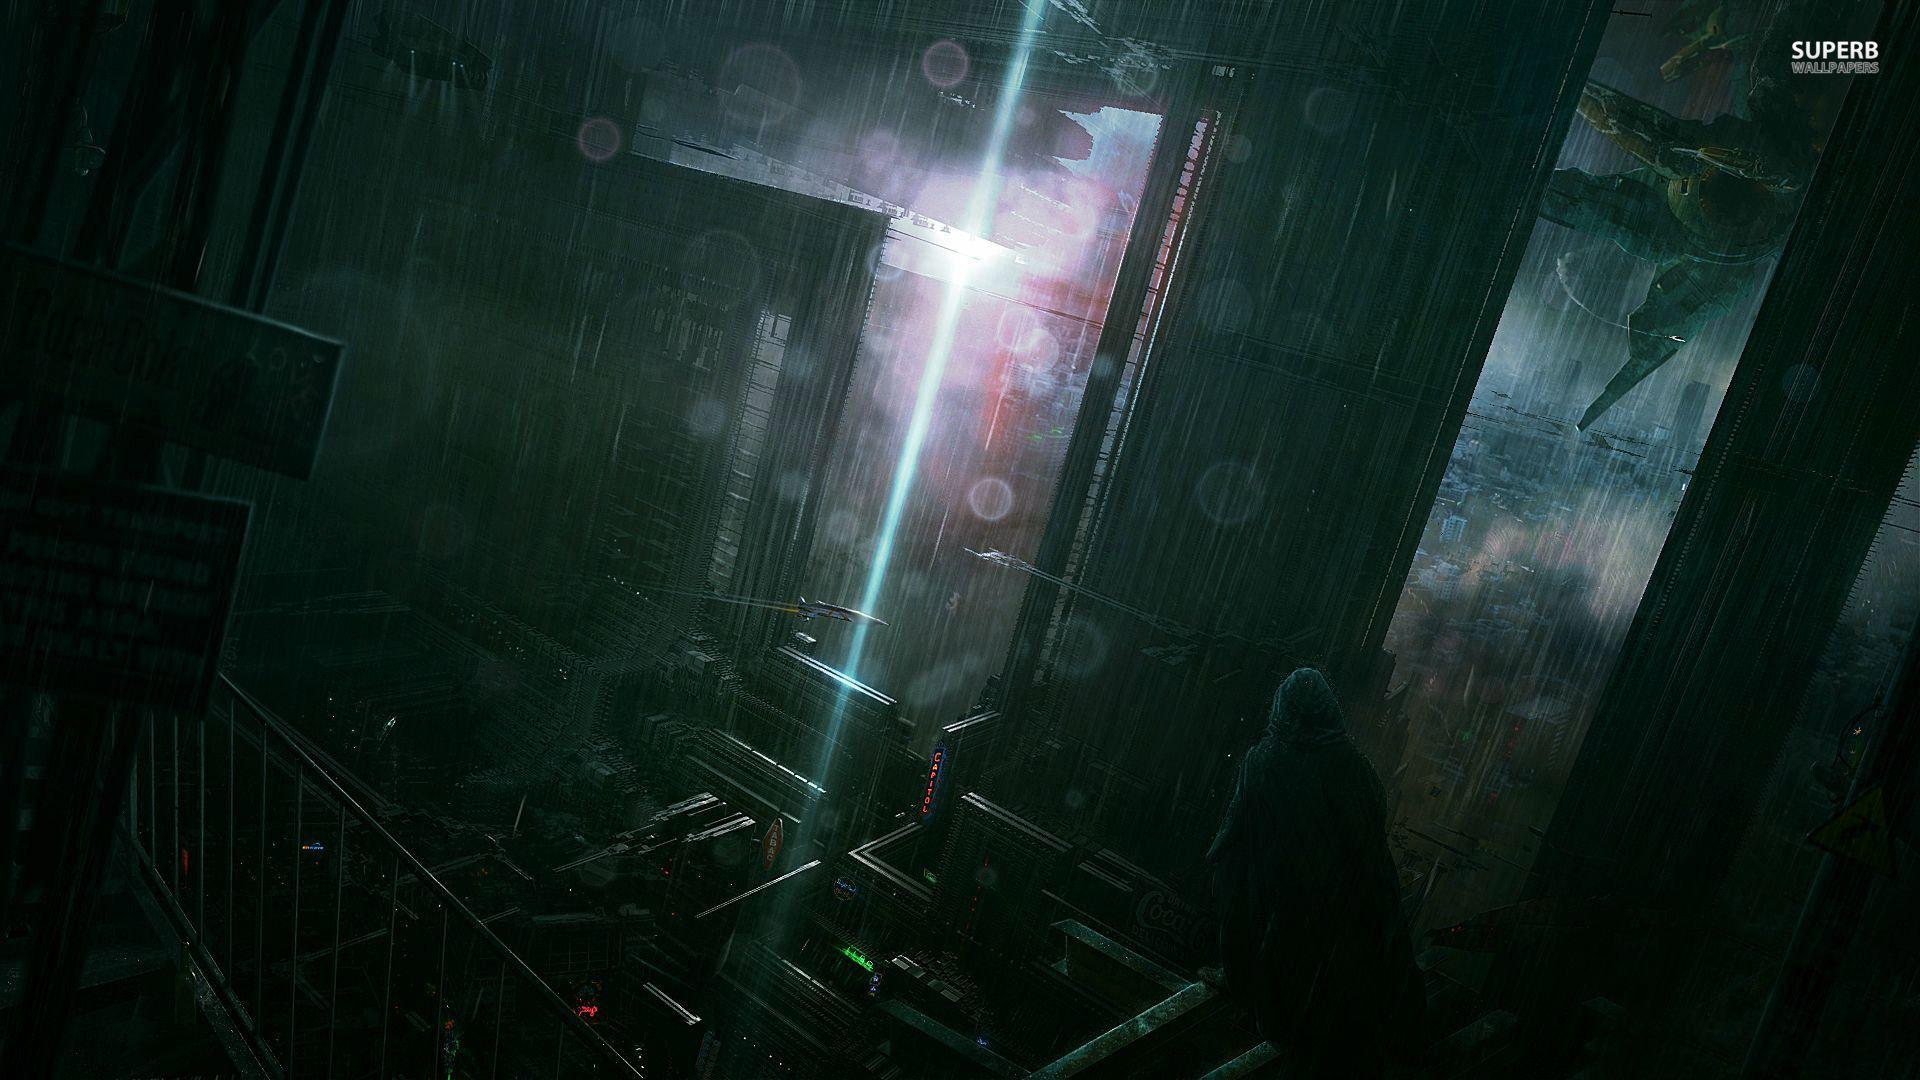 http://all-images.net/wallpaper-science-fiction-hd-fond-ecran-gratuit-hd43-2/